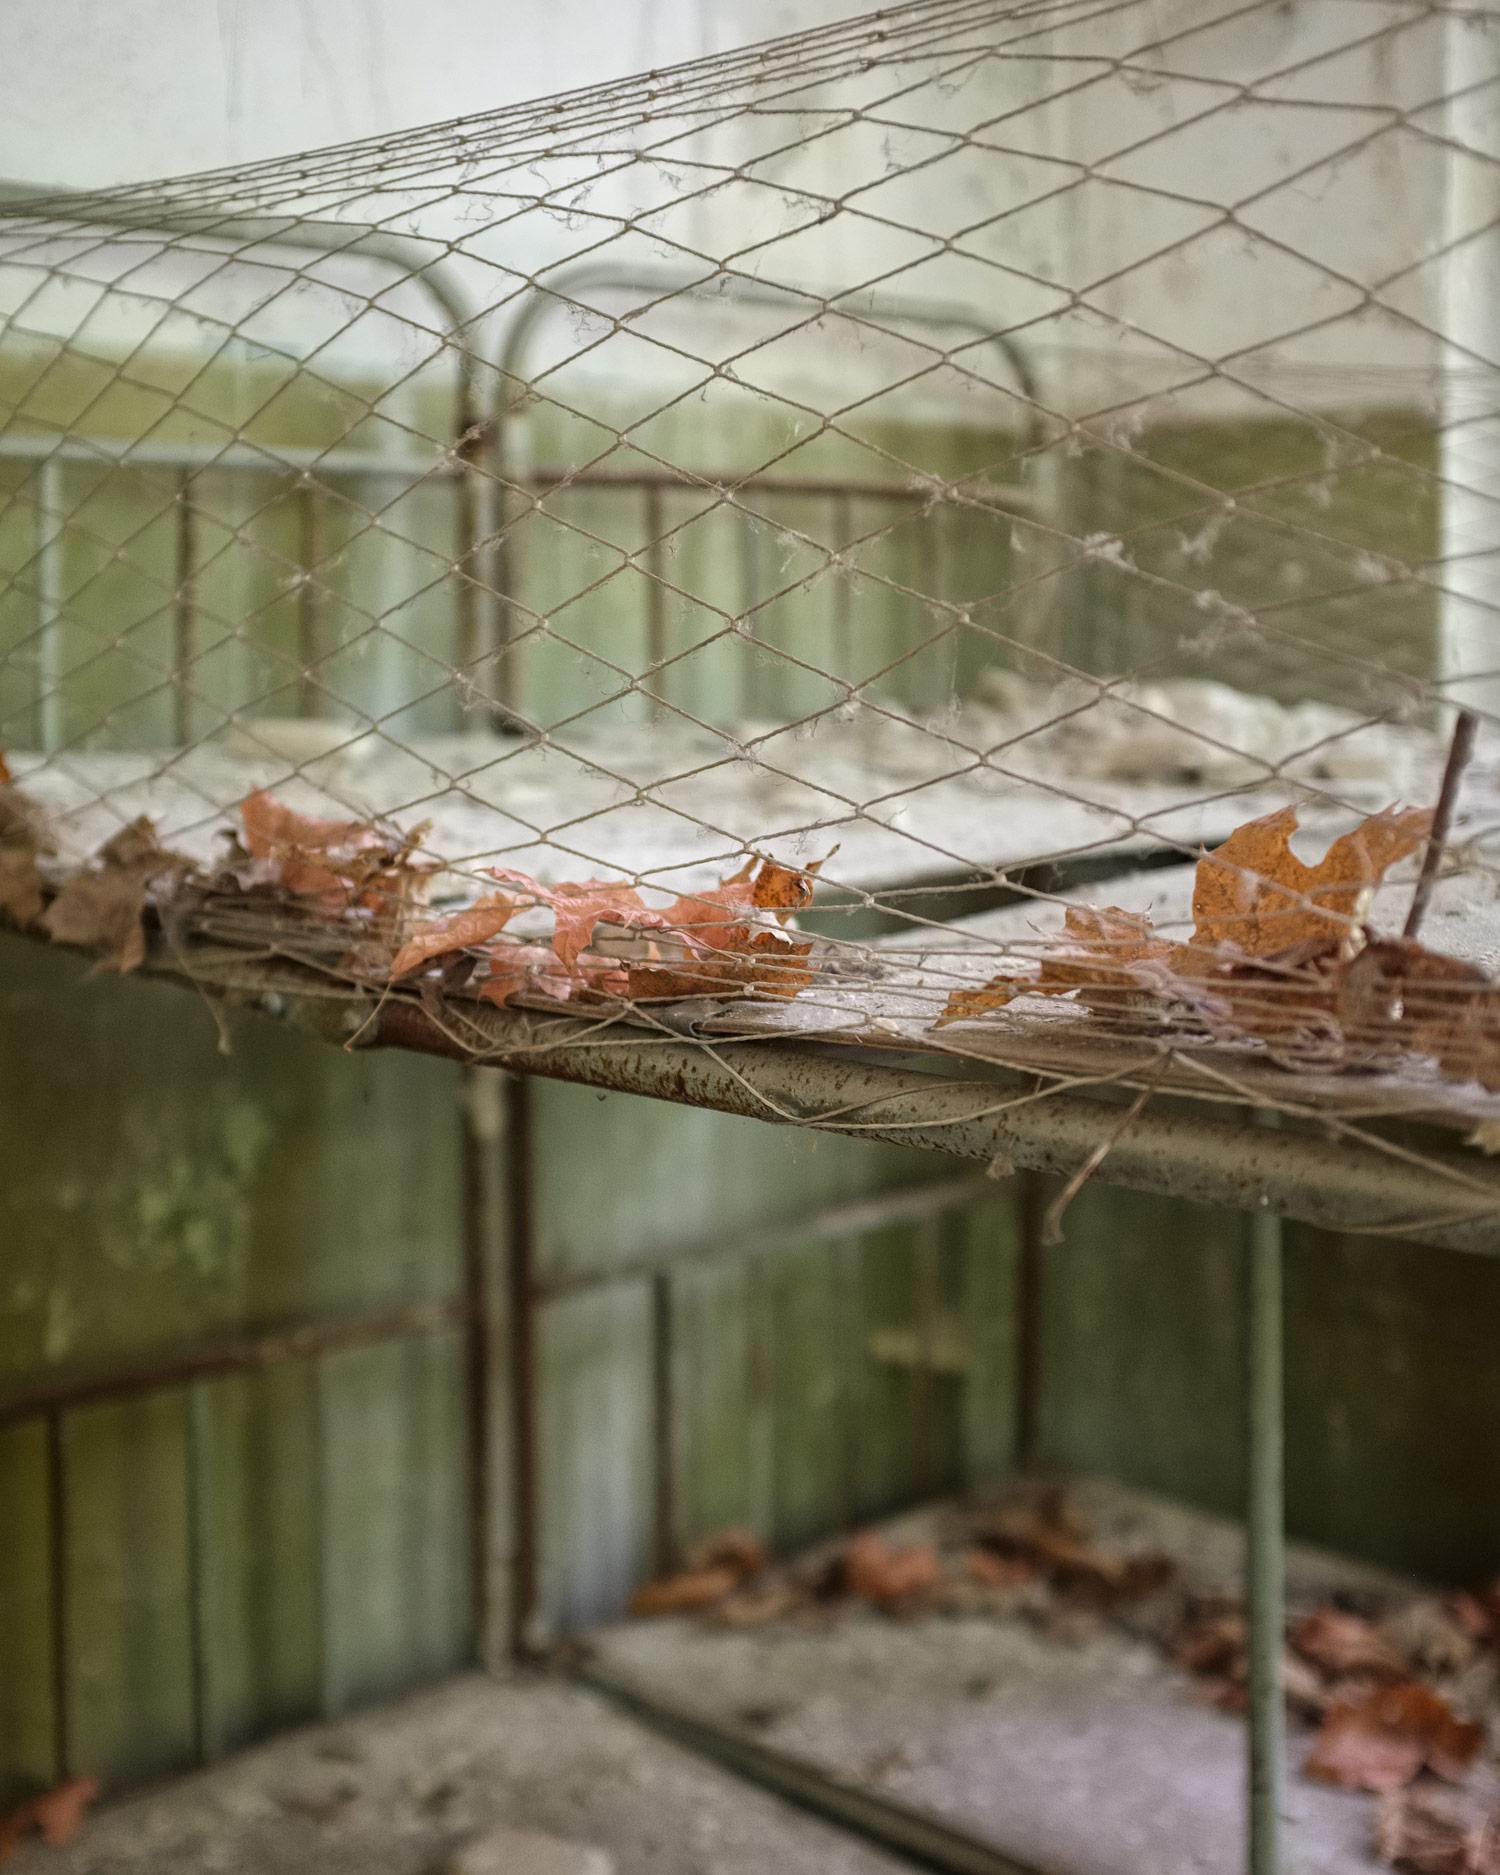 003_chernobyl_KopachiDaycare_w.jpg